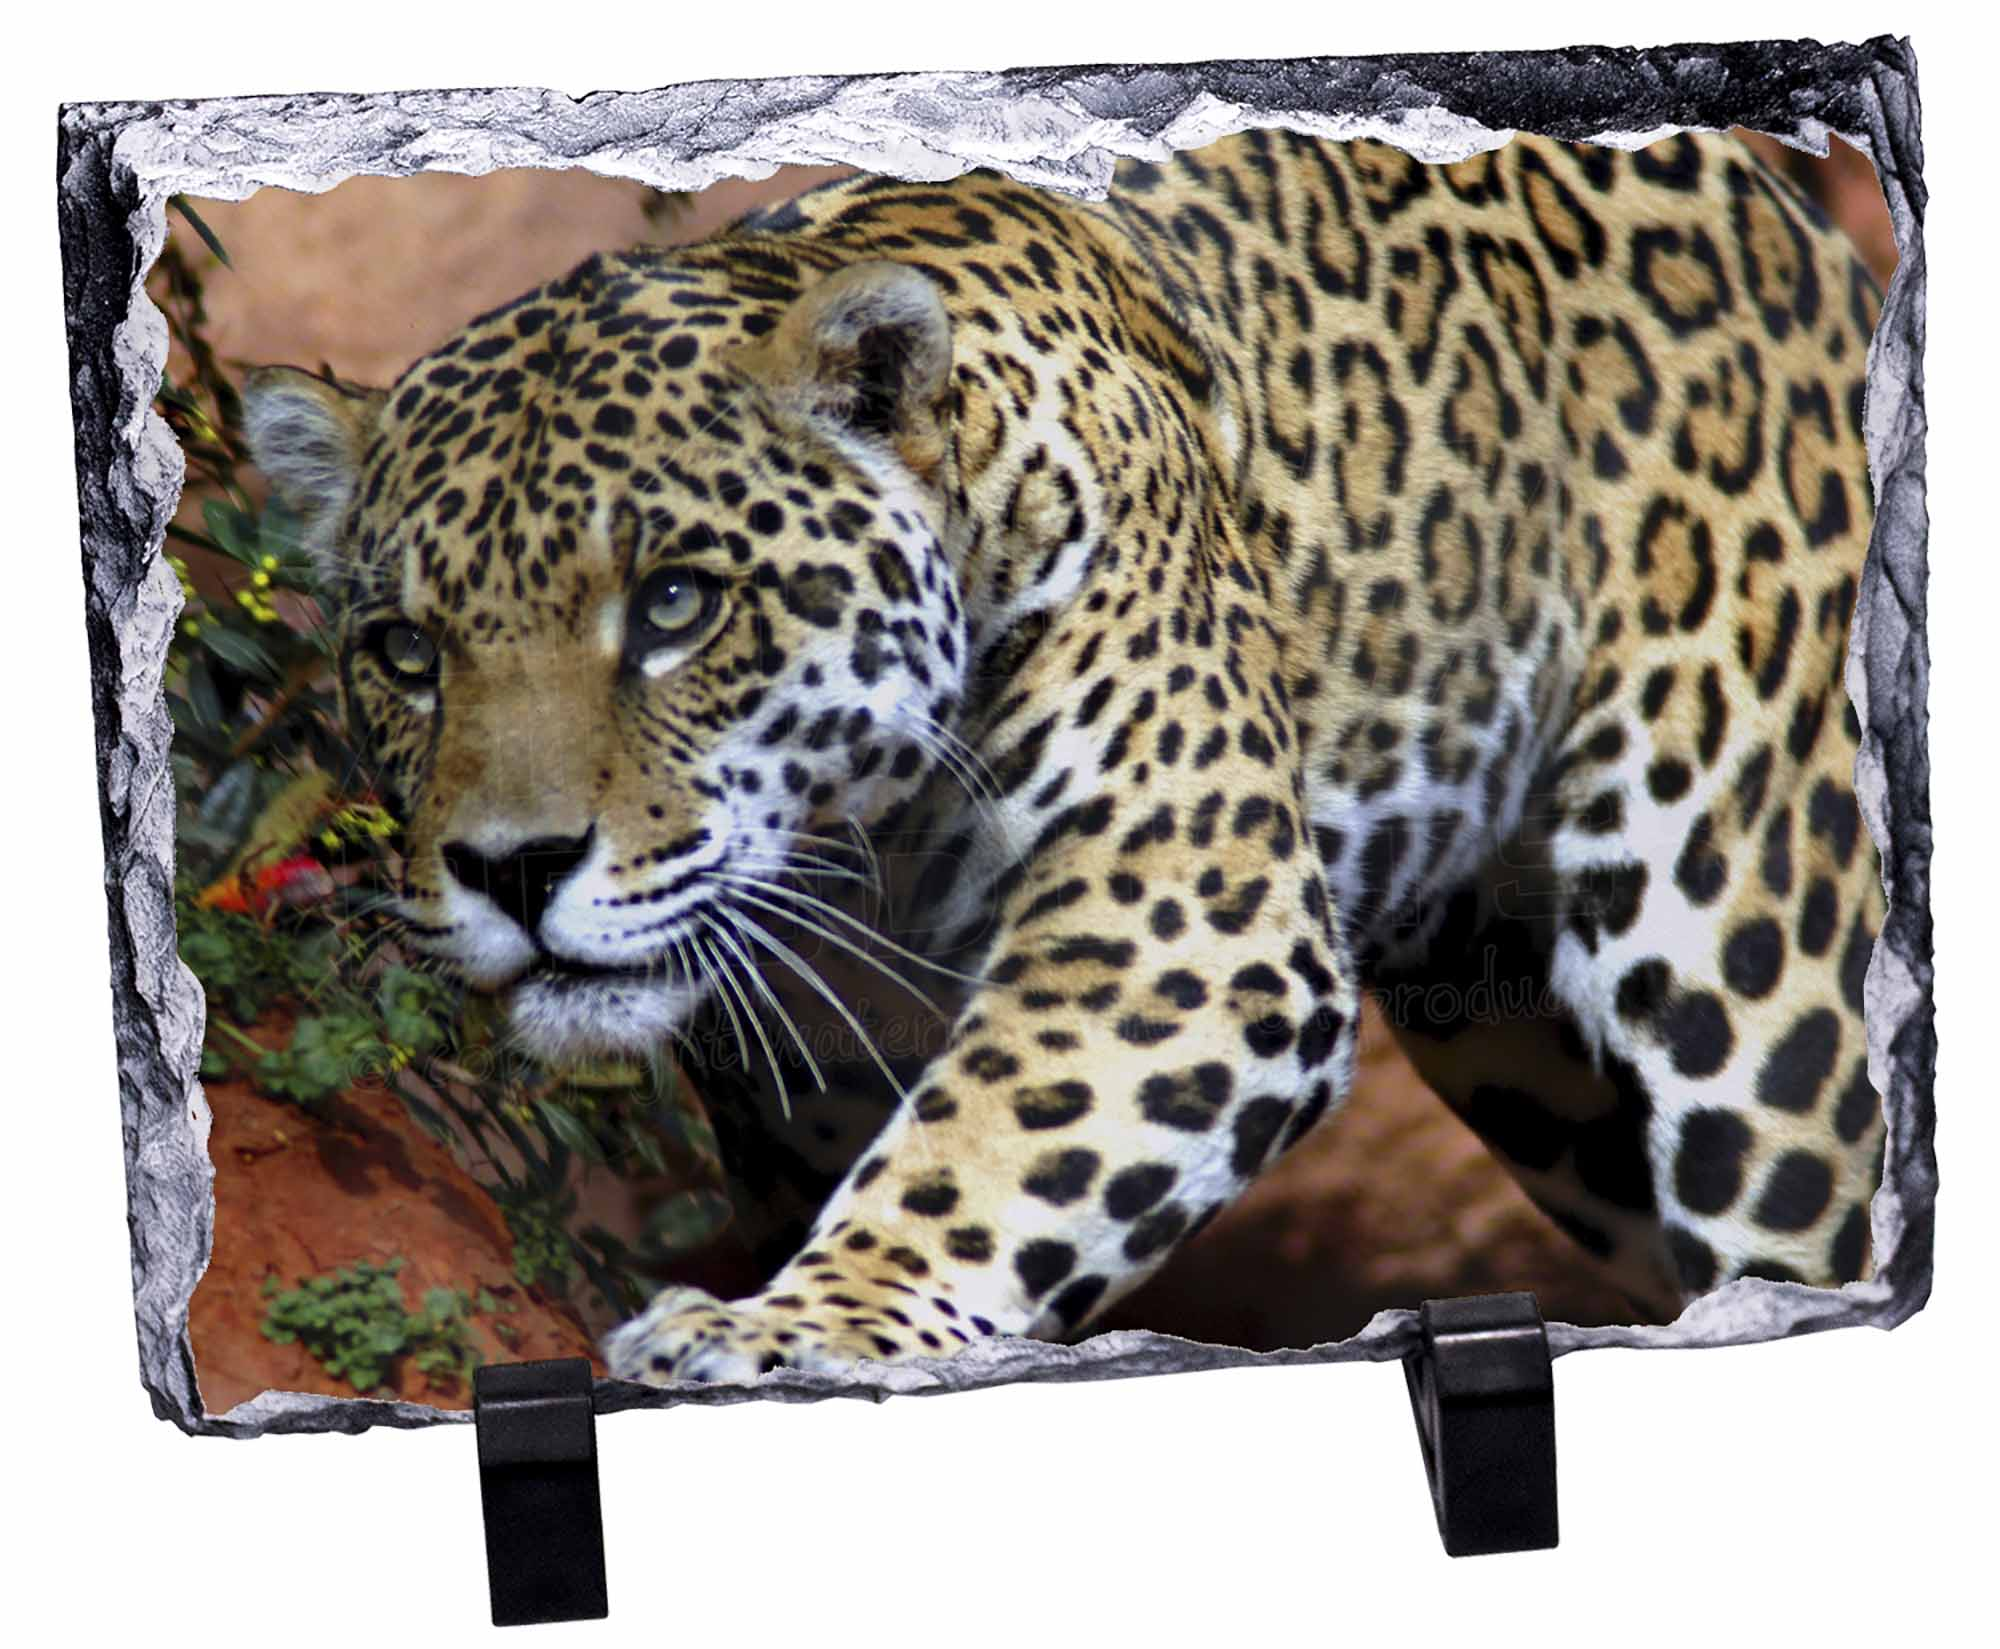 Jaguar Photo Slate Christmas Gift Ornament AT-4SL